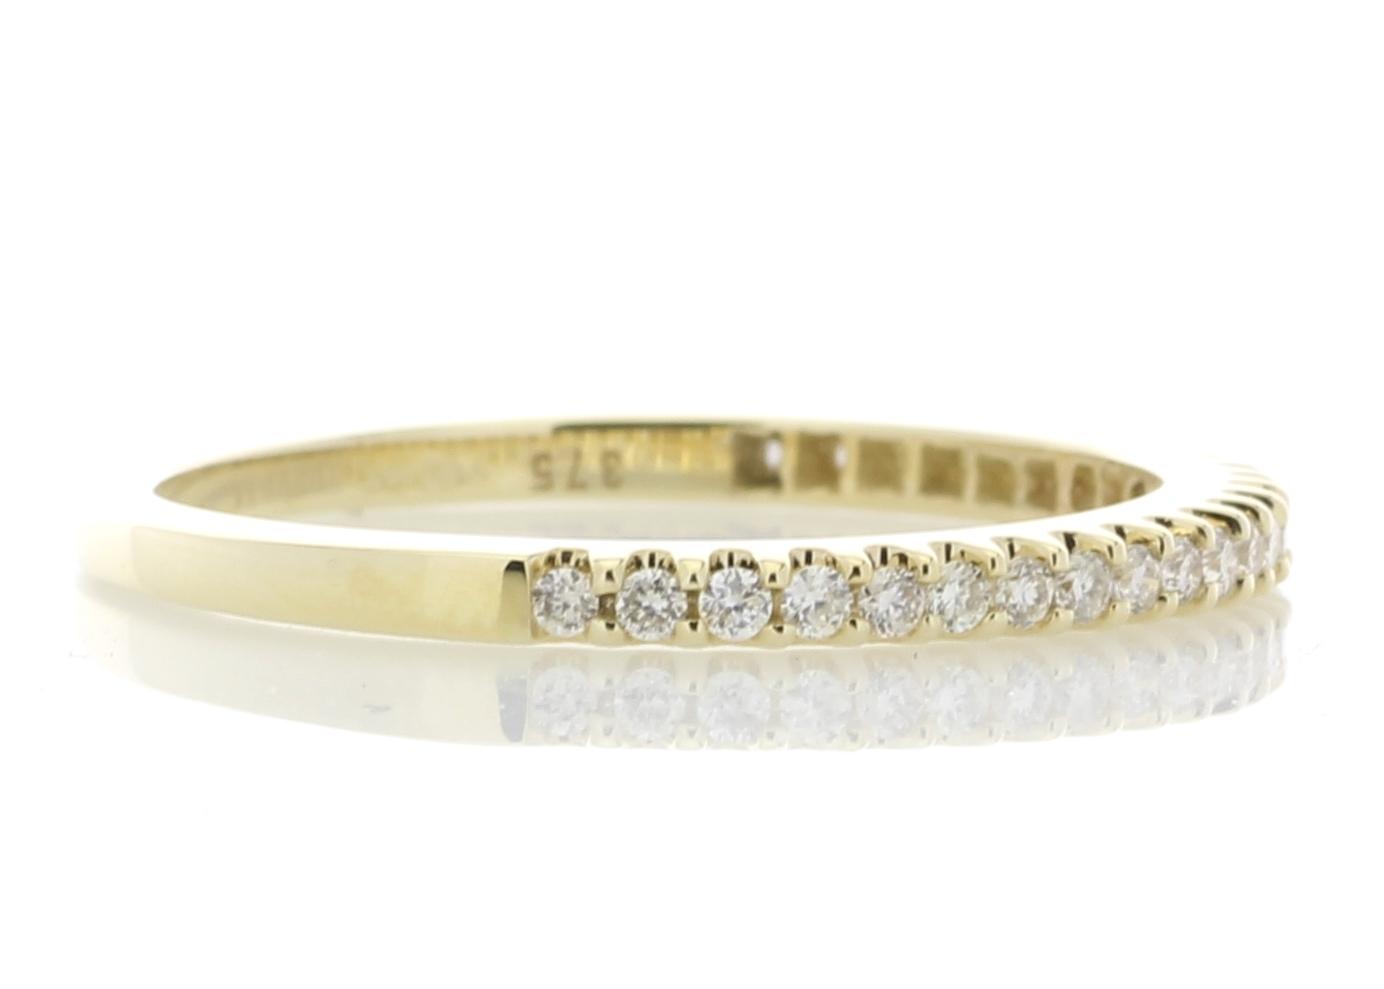 Lot 43 - 9ct Yellow Gold Diamond Half Eternity Ring 0.25 Carats